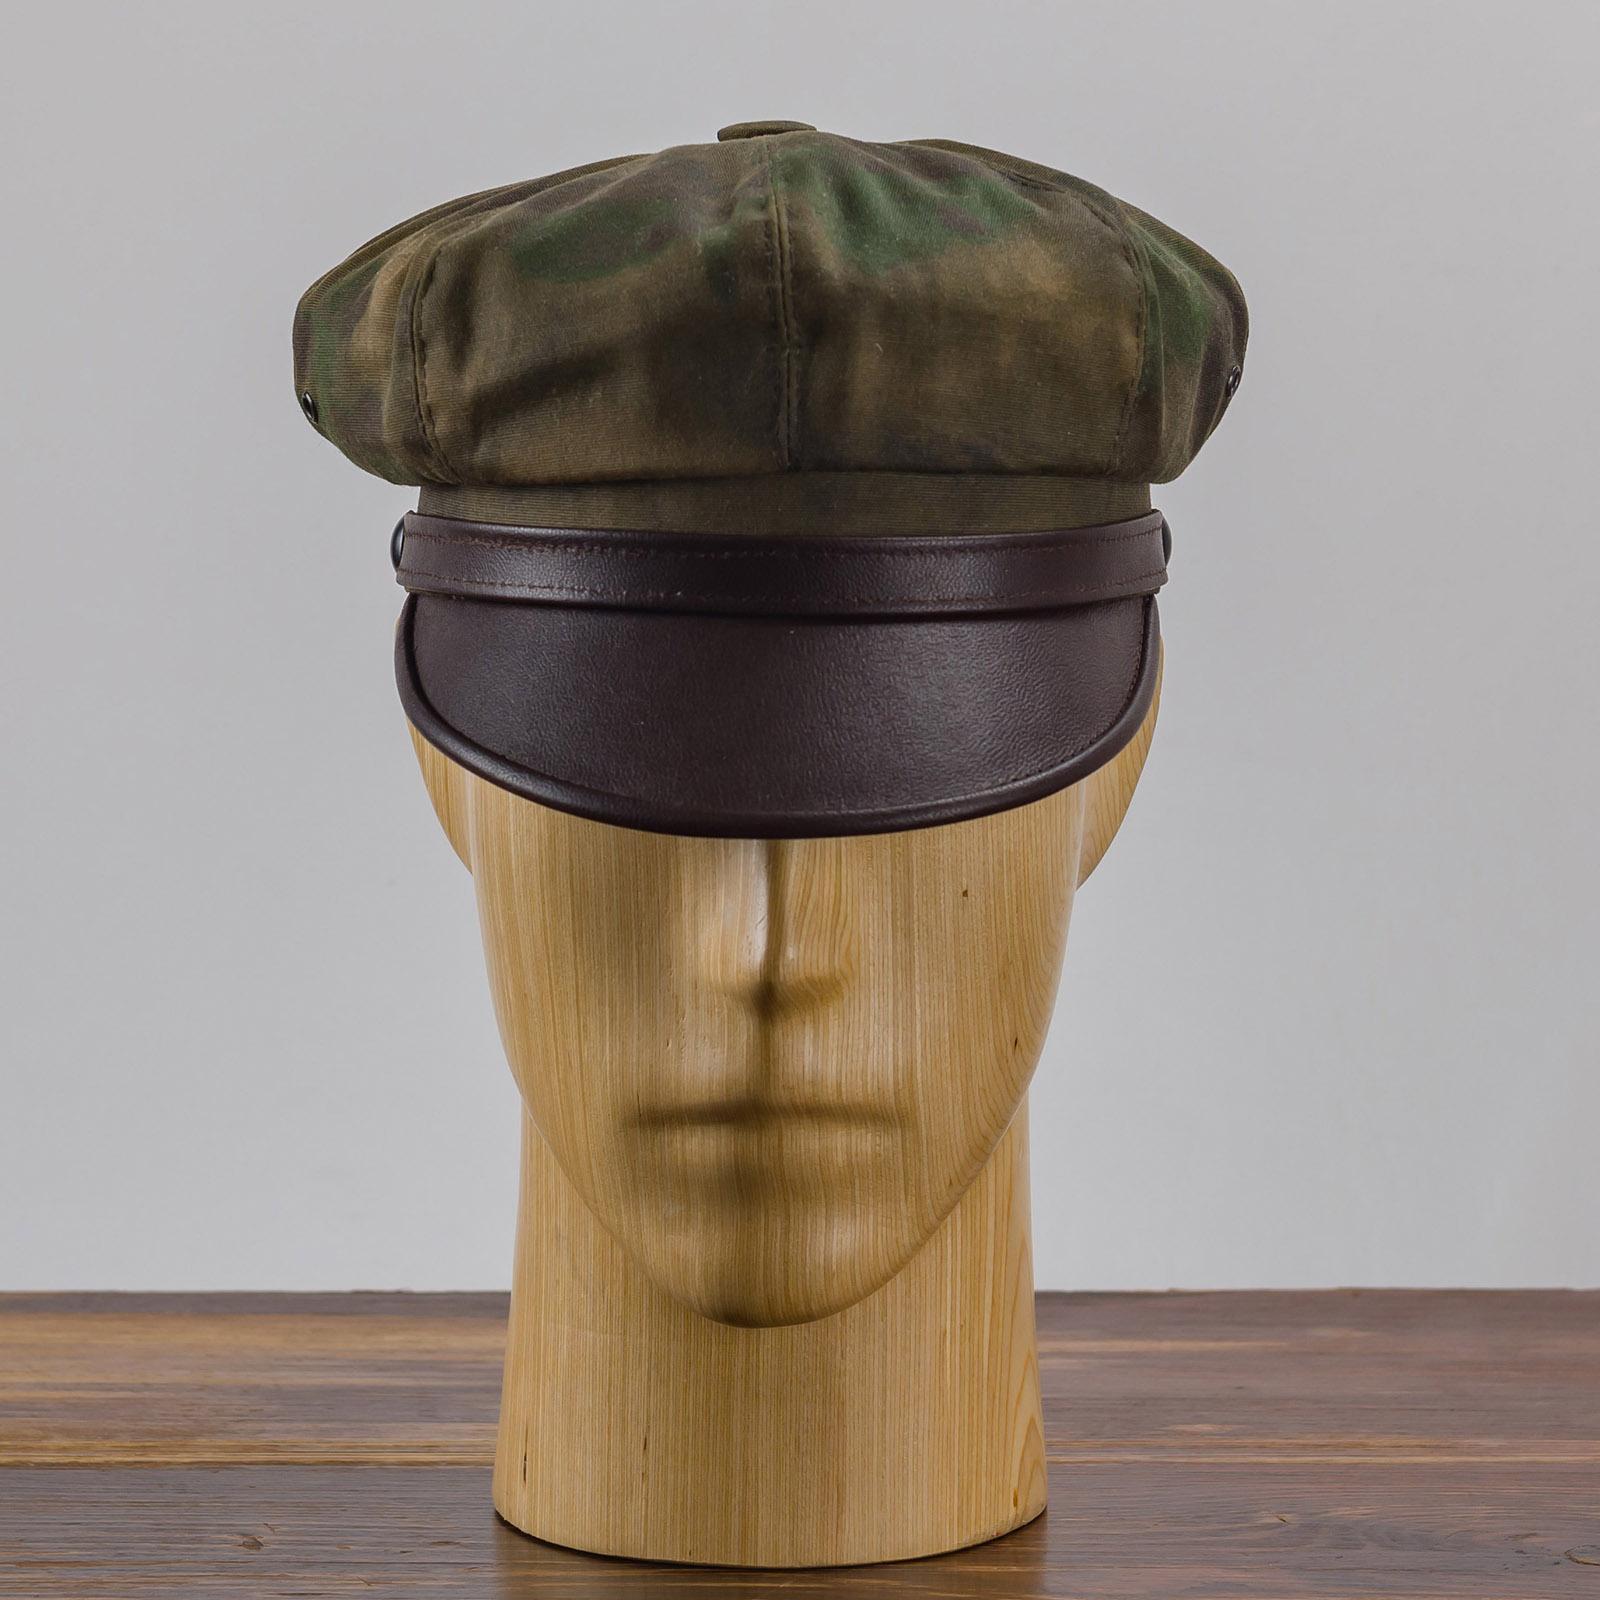 Waxed cotton leather visor vintage motorcycle cap rockabilly punk style biker chopper cruiser Marlon Brando